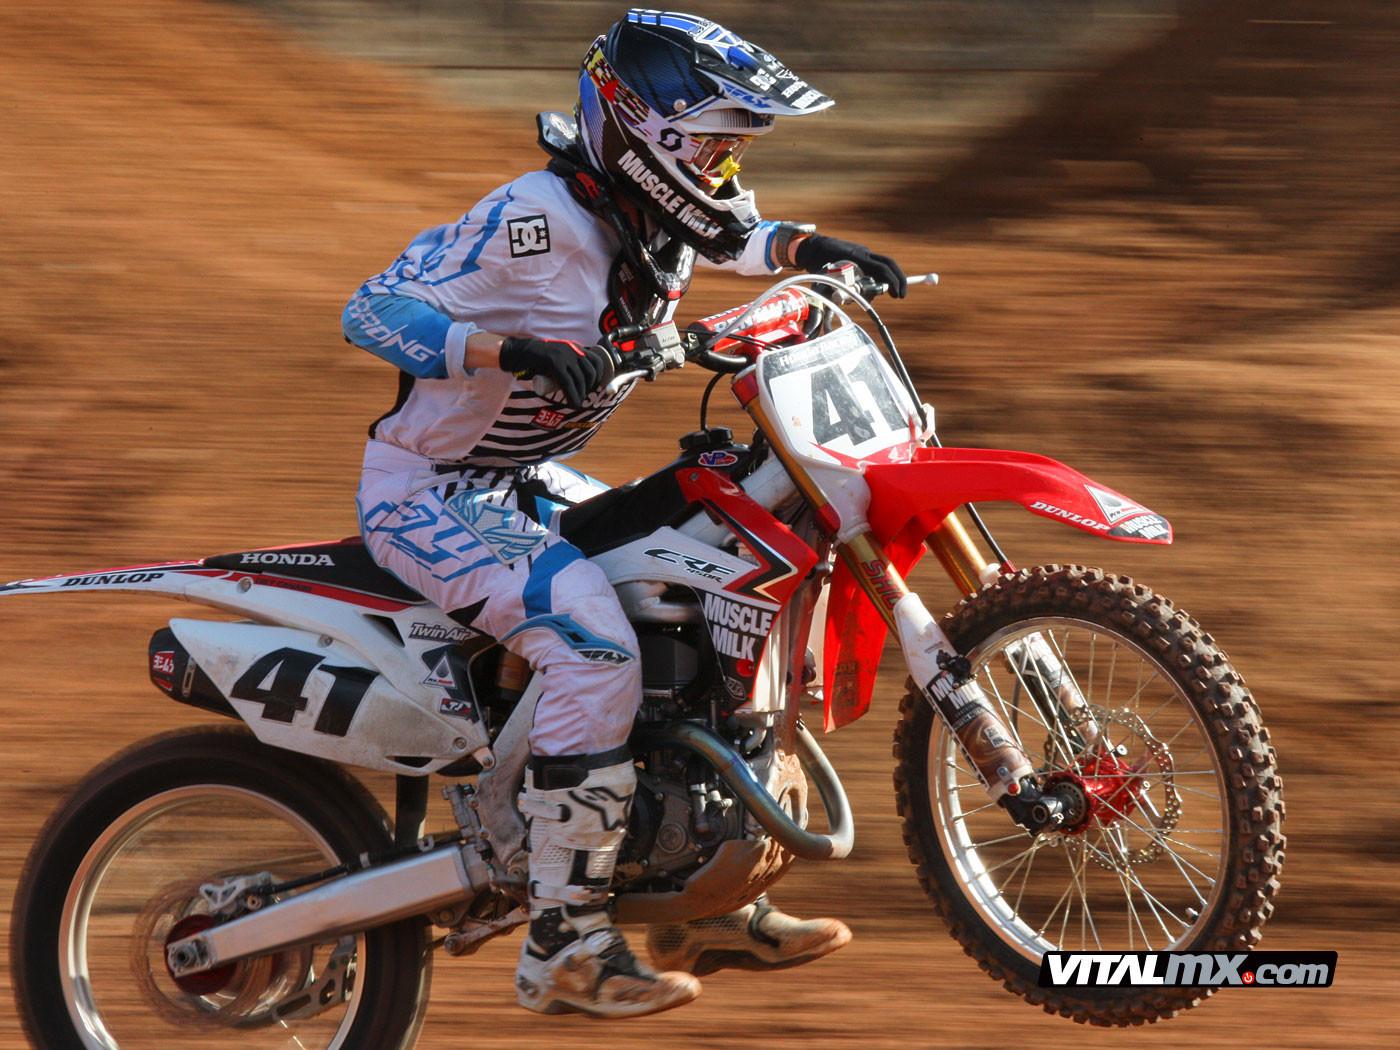 Trey Canard - Countdown to Supercross: Trey Canard - Motocross Pictures - Vital MX